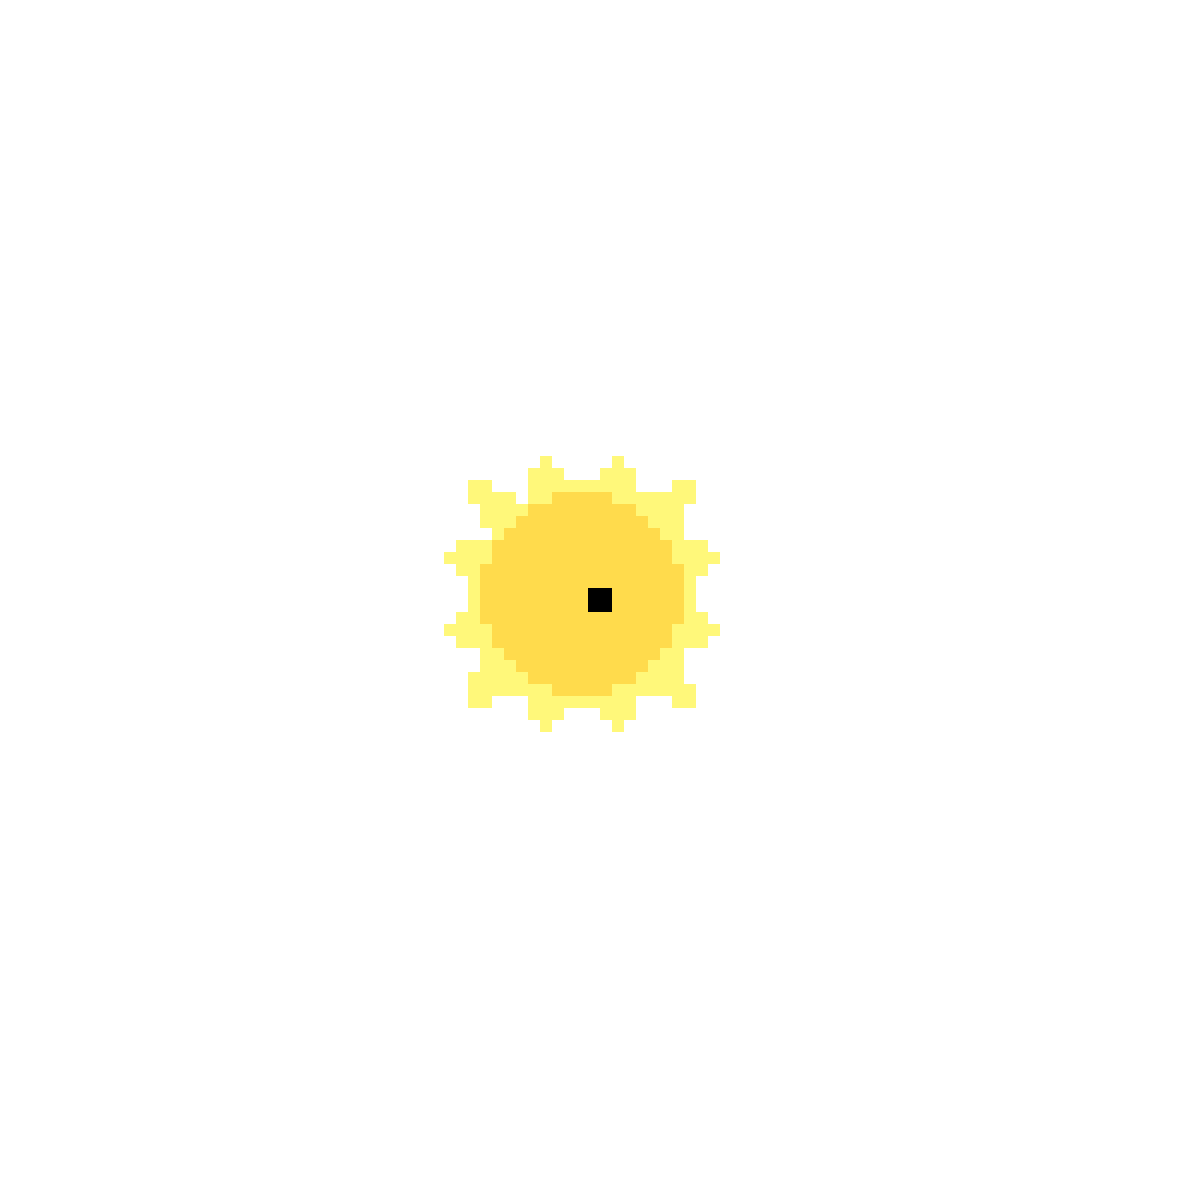 SUN by Tempest